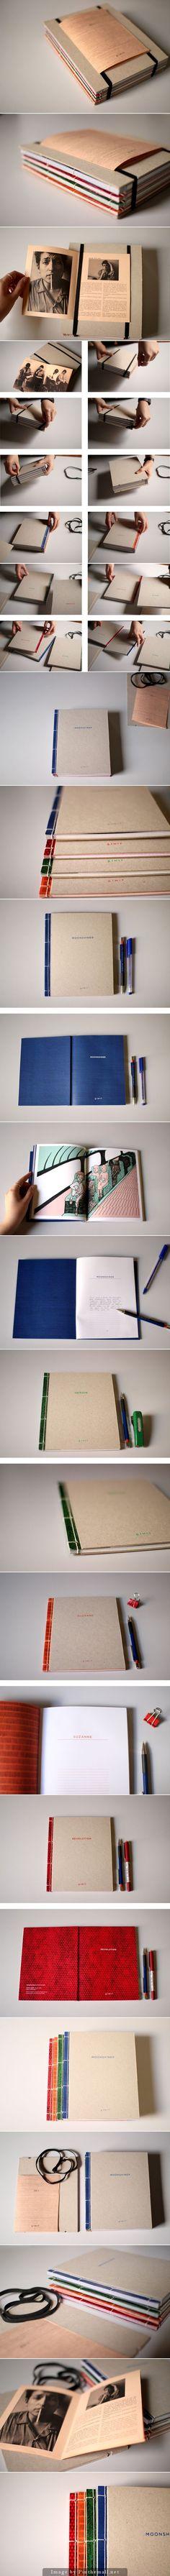 Gorgeous organized layout